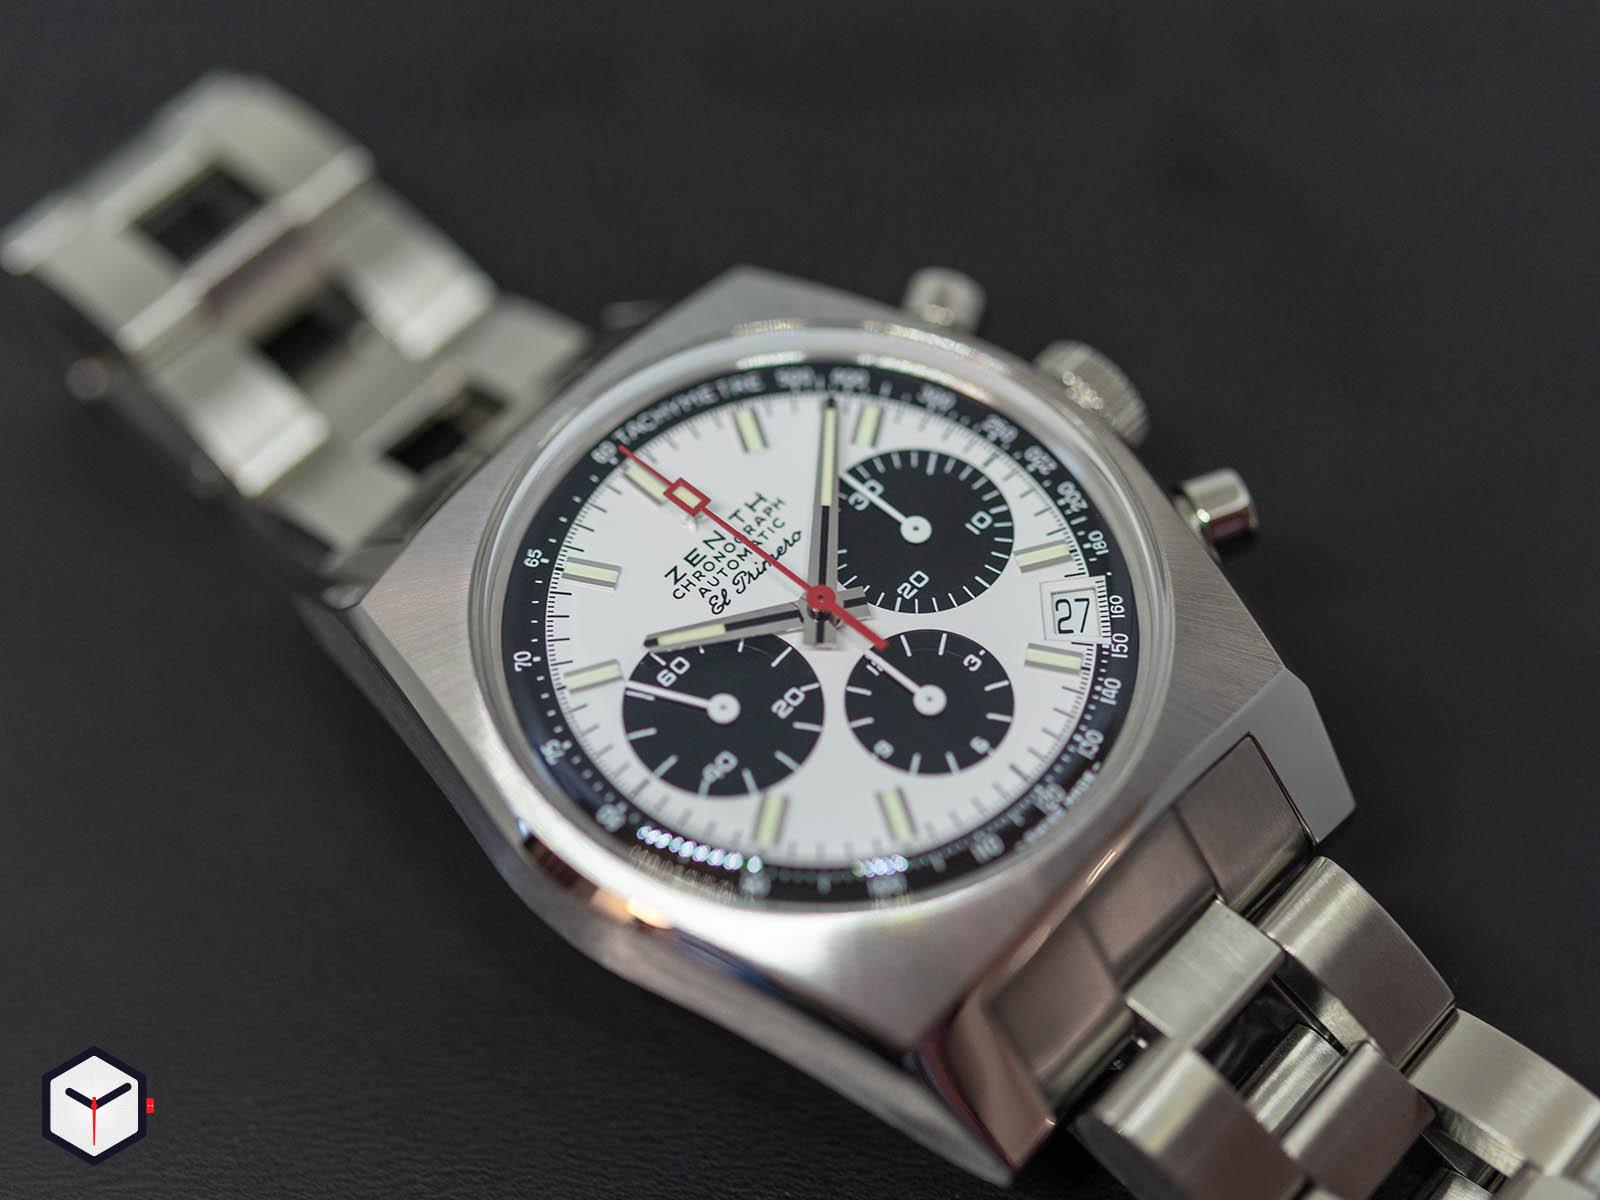 03-a384-400-21-m384-zenith-chronomaster-el-primero-a384-revival-2.jpg